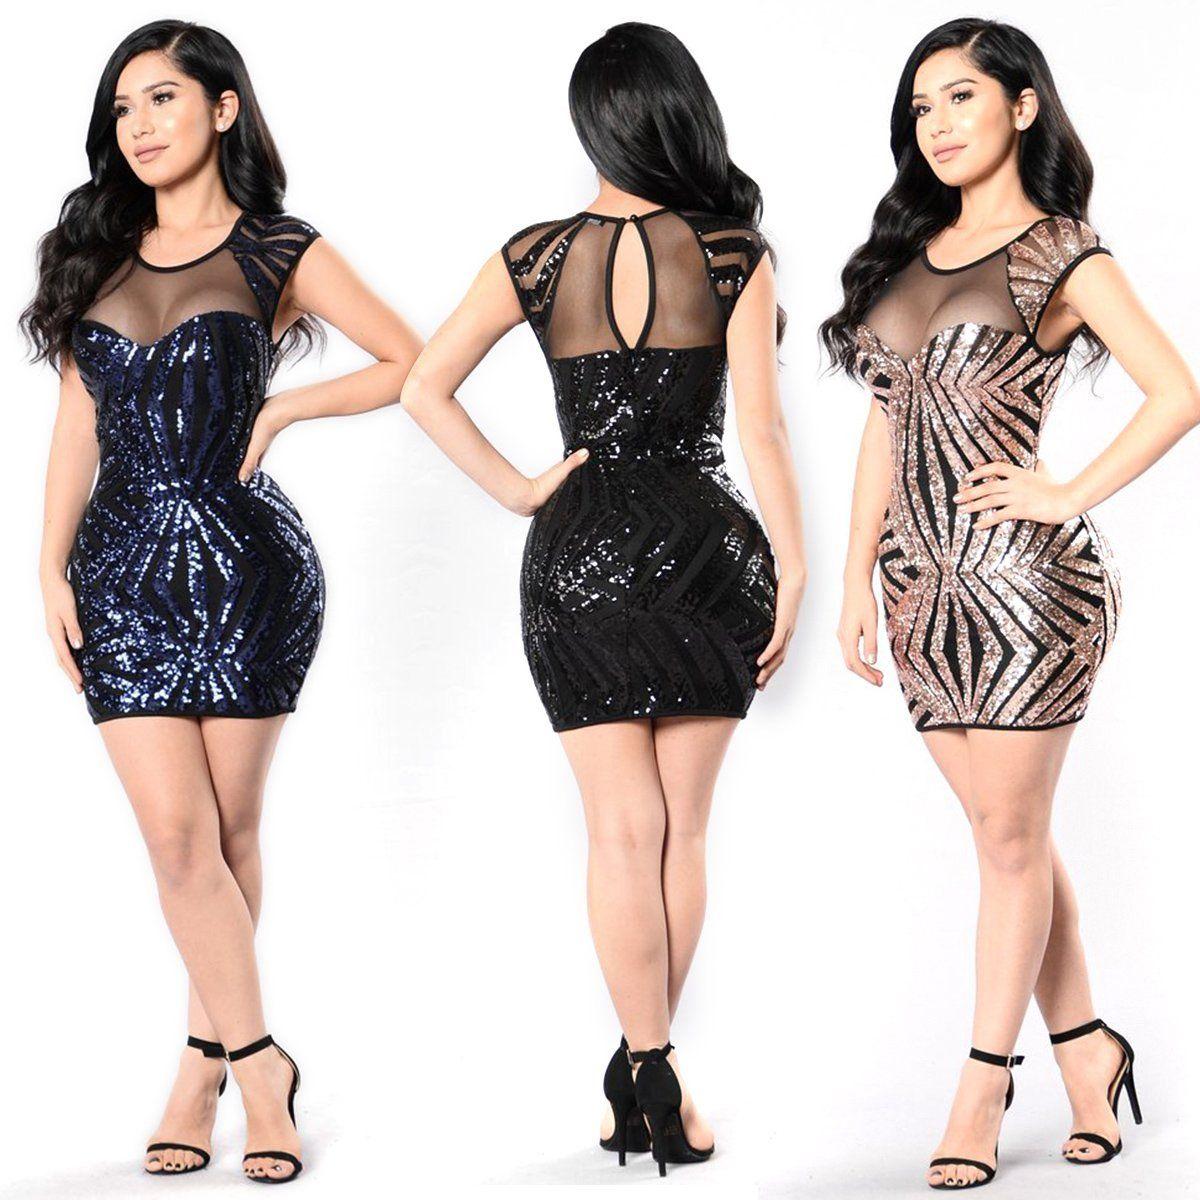 92b6545303a3 Women s Bandage Bodycon Sleeveless Evening Party Cocktail Club Short Mini  Dress